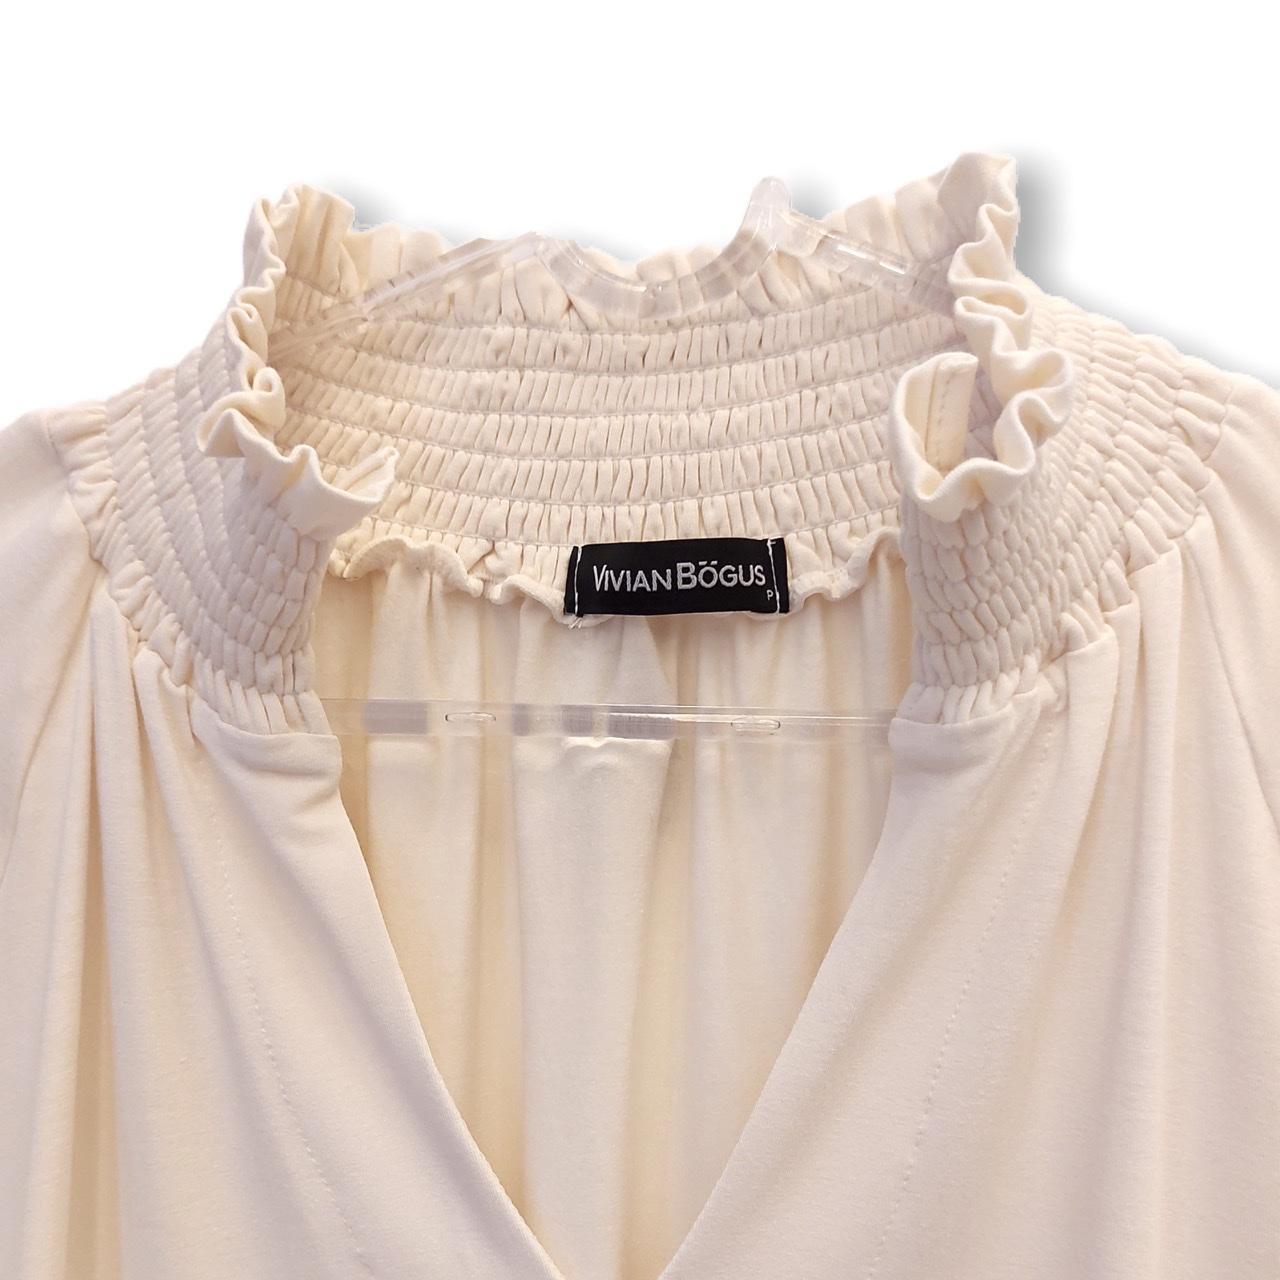 Blusa Ana Paula off white